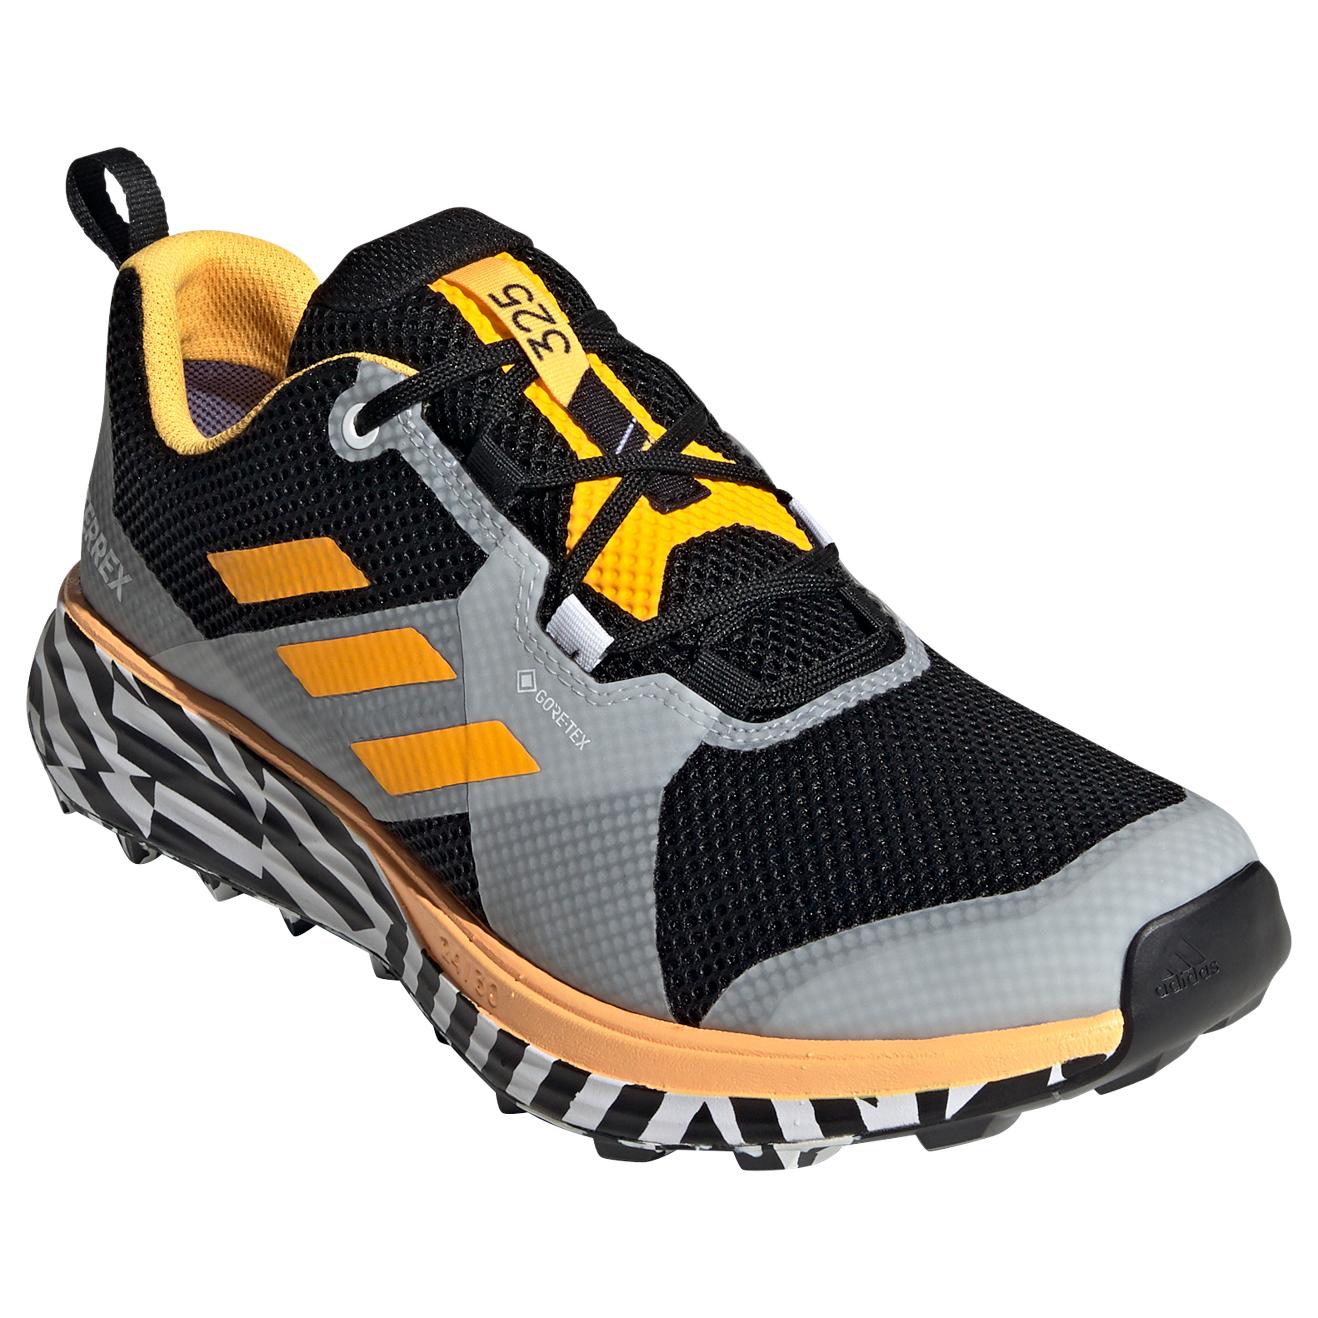 Adidas Terrex Two GTX - Trail running